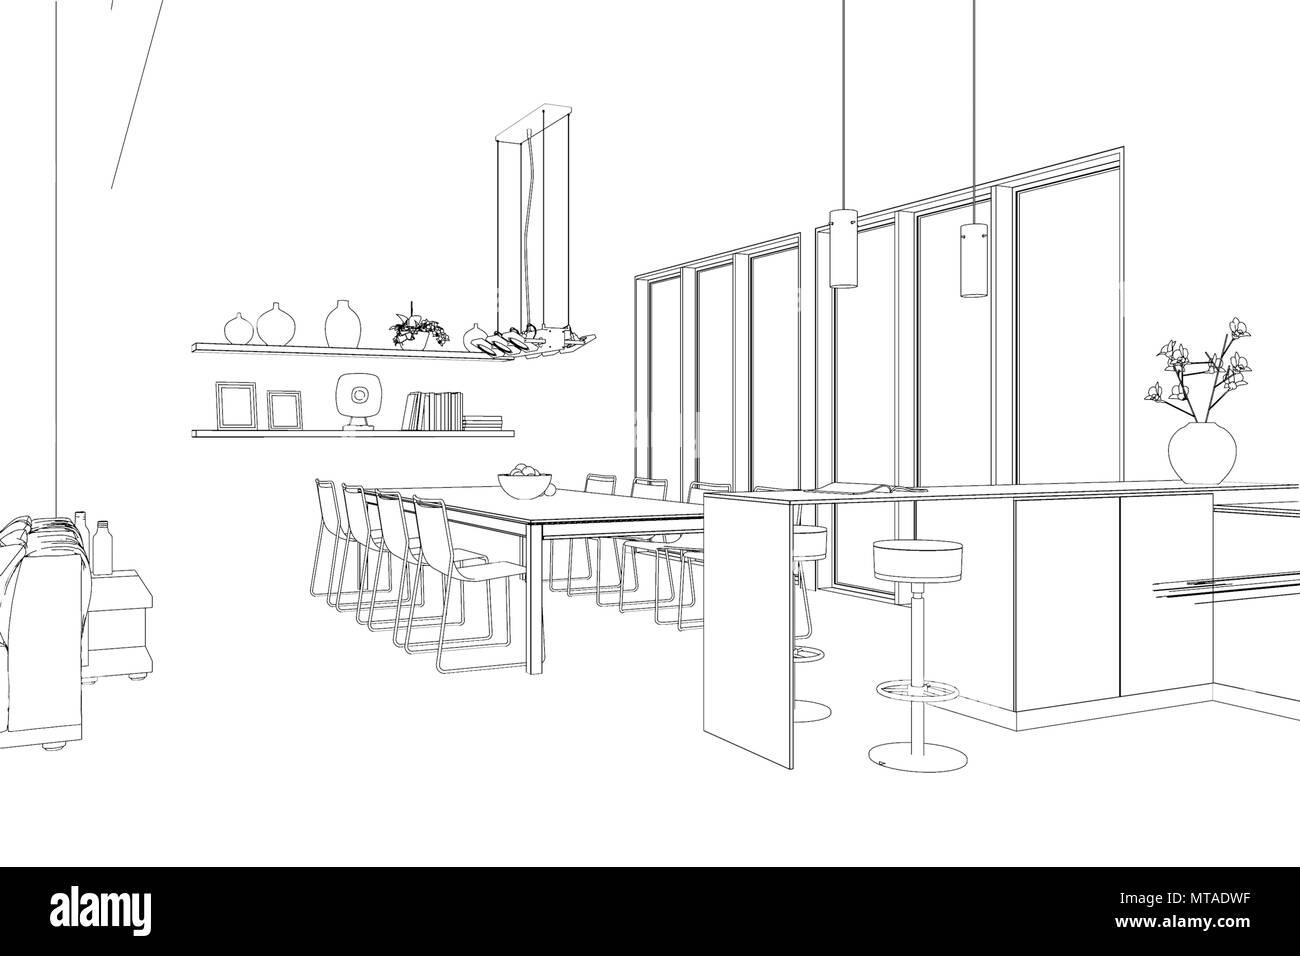 Interior Design modern Loft custom Drawing Stock Photo ... on interior design board layout, interior design plan view, interior design flowchart, interior design block diagram,